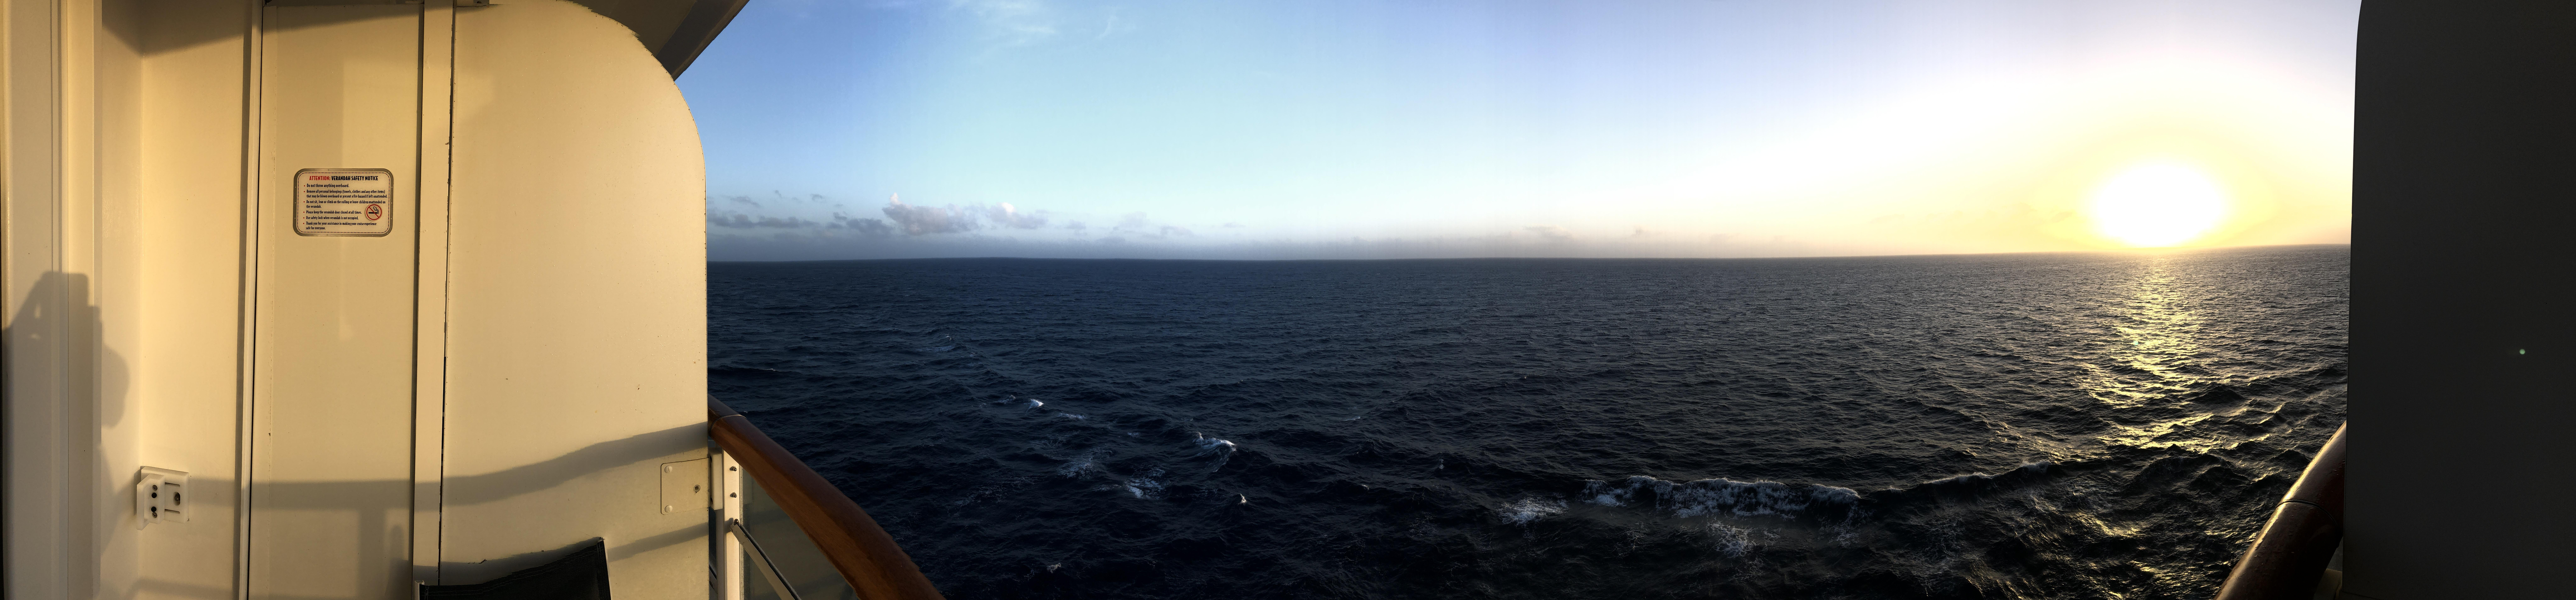 Atlantic_Ocean_13.01.20_3530.jpg 1